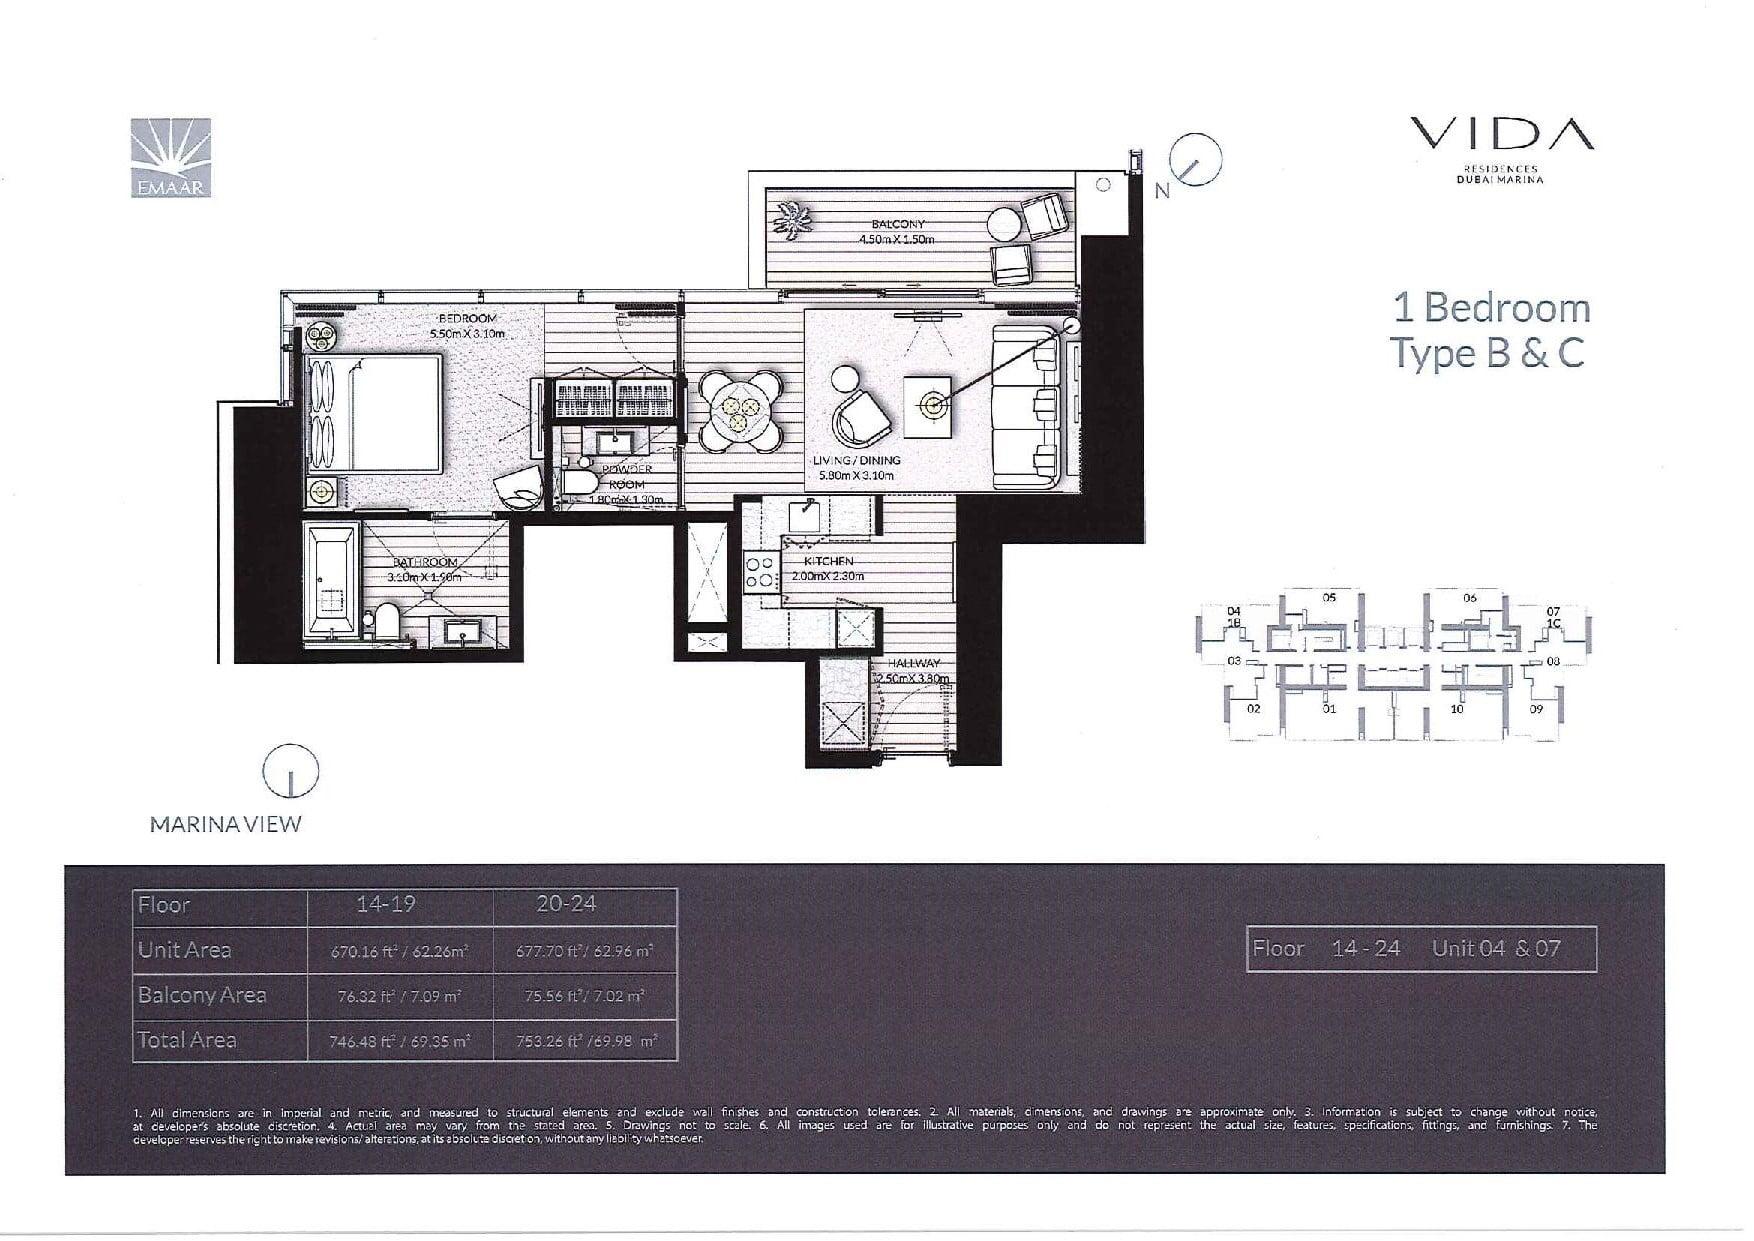 Vida Residences Floor Plans page 004 - Floor Plans - Vida Residences Dubai Marina